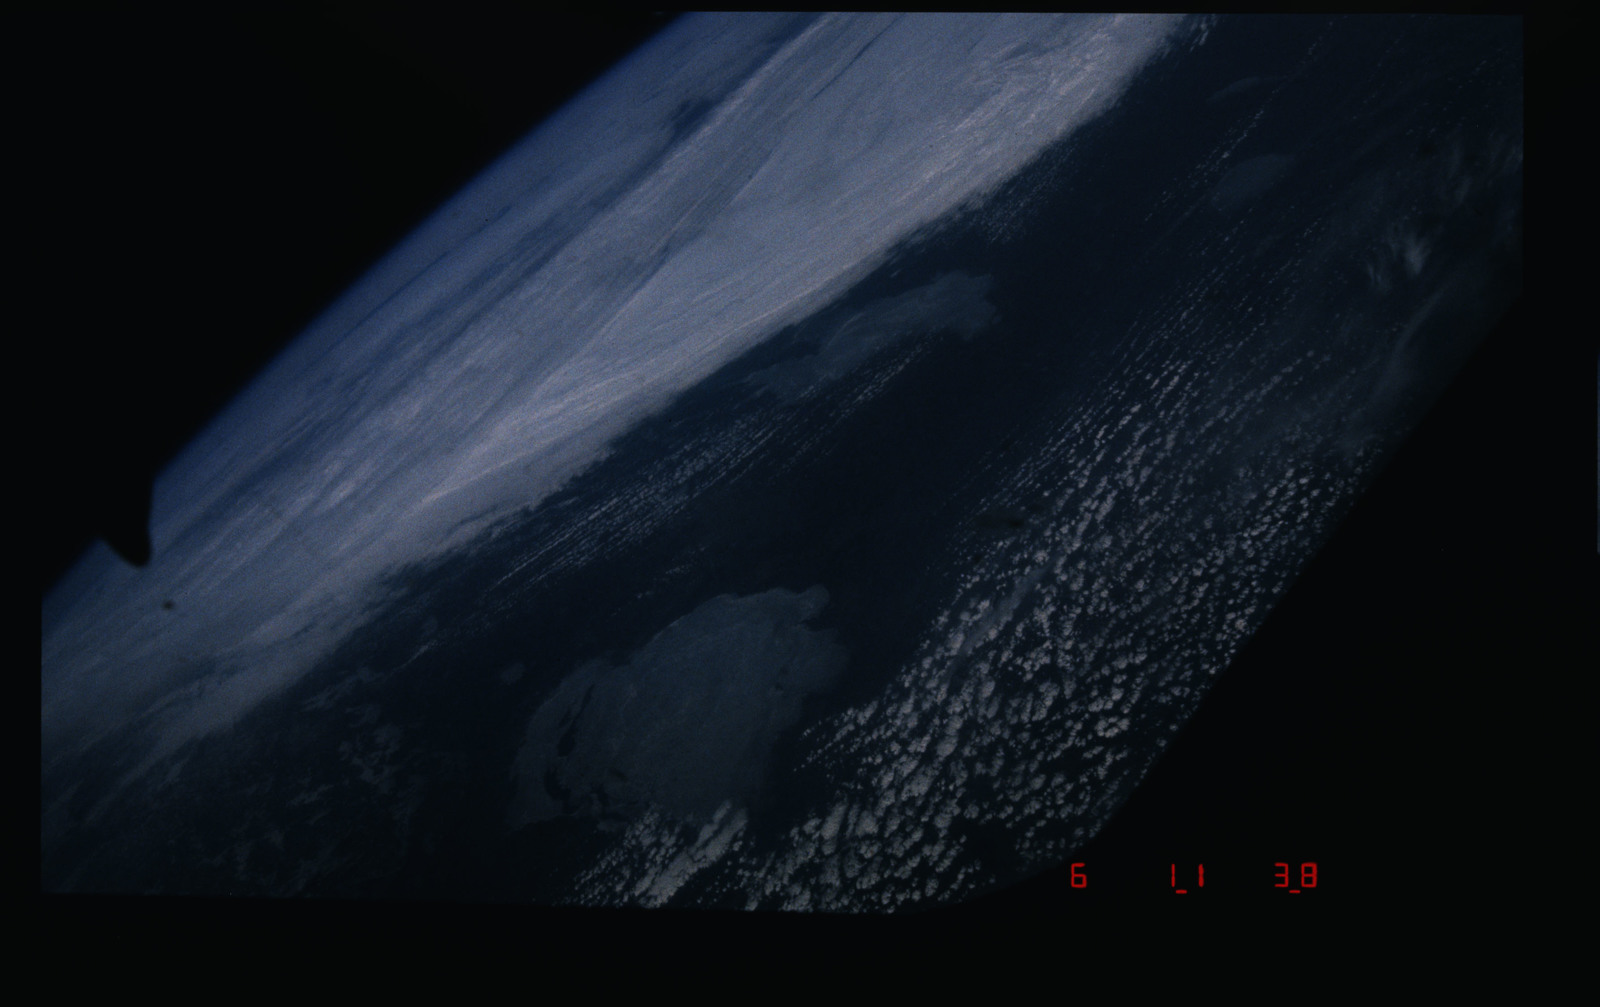 51B-106-032 - STS-51B - 51B earth observations